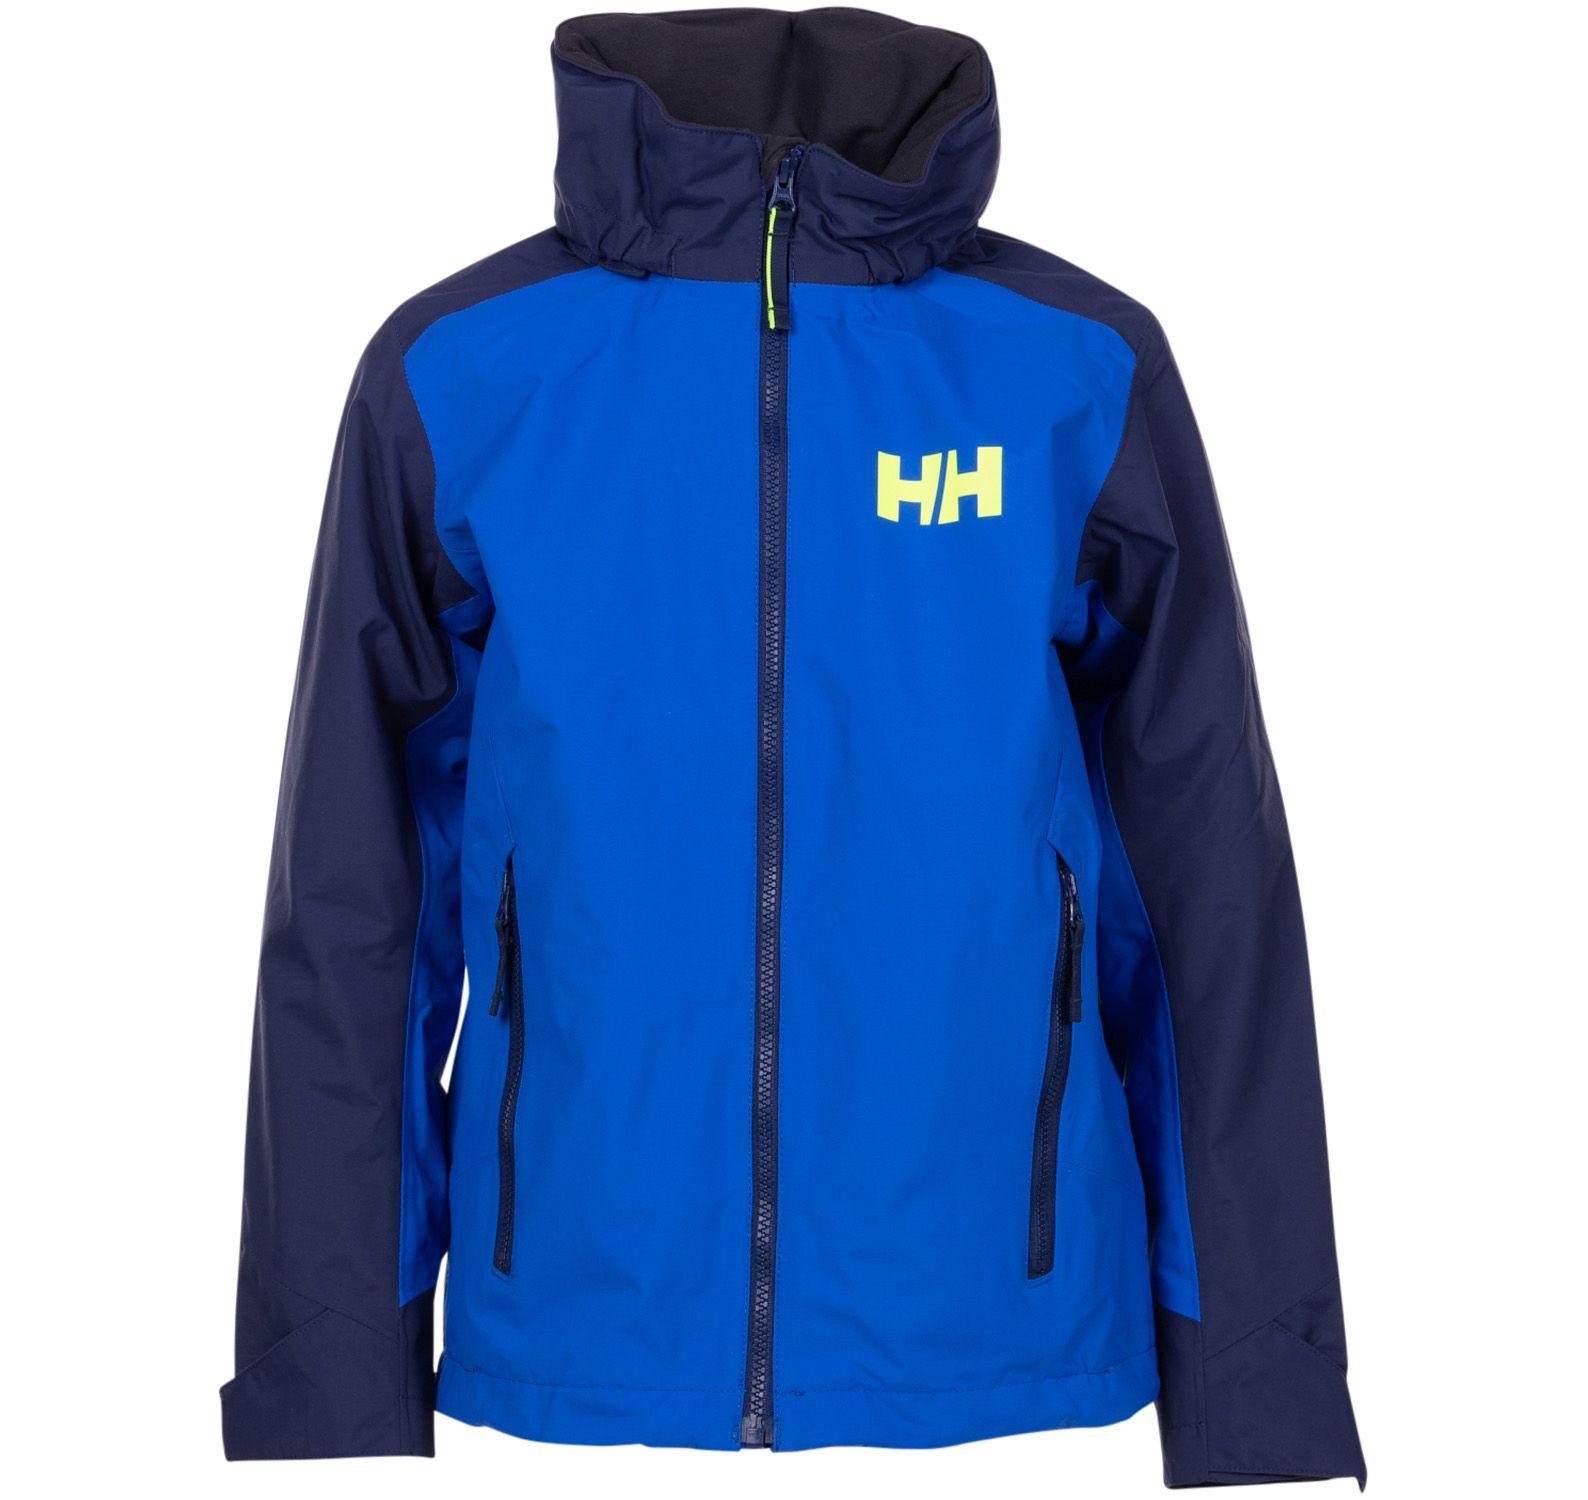 jr ridge jacket, 563 olympian blue, 140